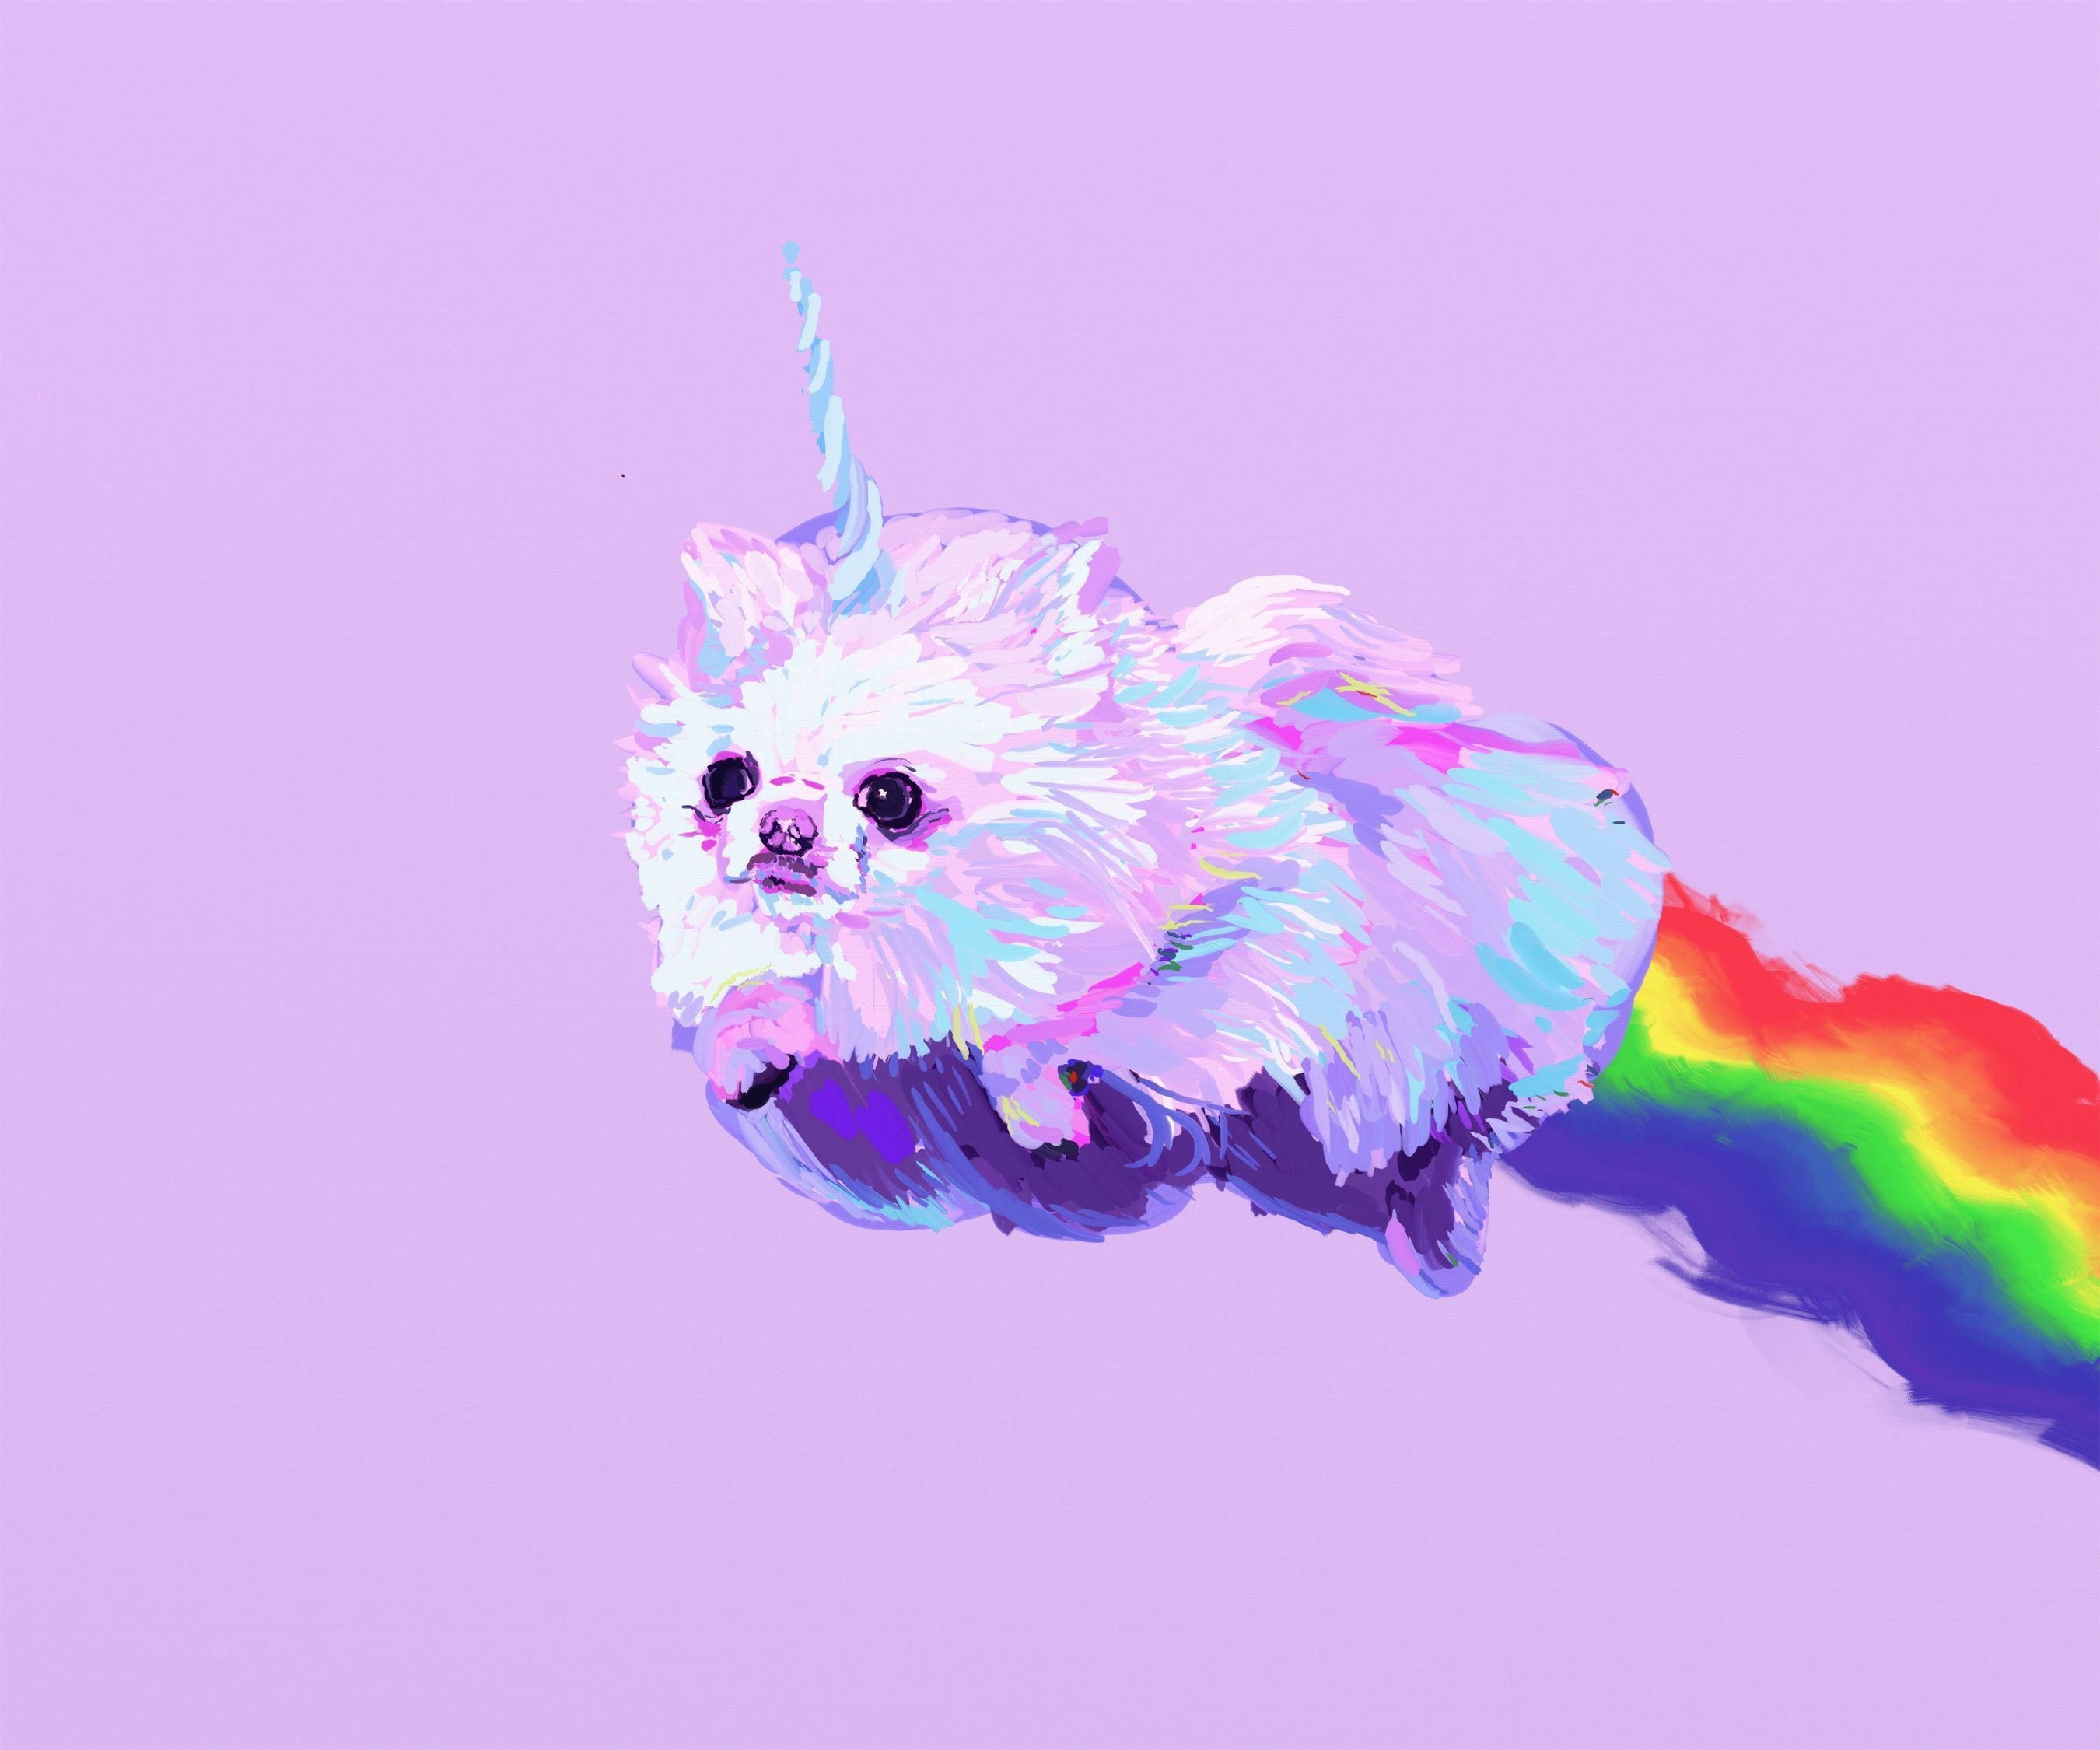 Dog Unicorn Wallpapers - Top Free Dog ...